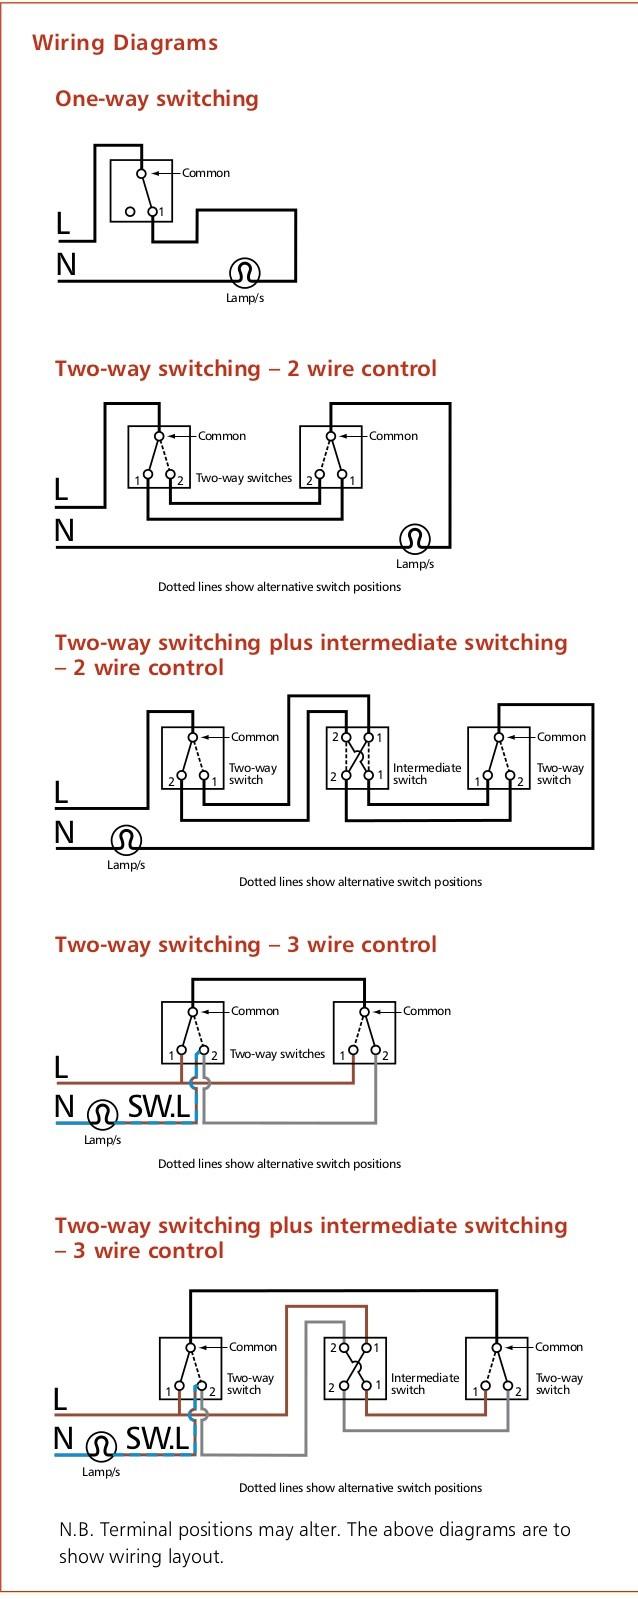 e Way Lighting Circuit Wiring Diagram And sensecurity